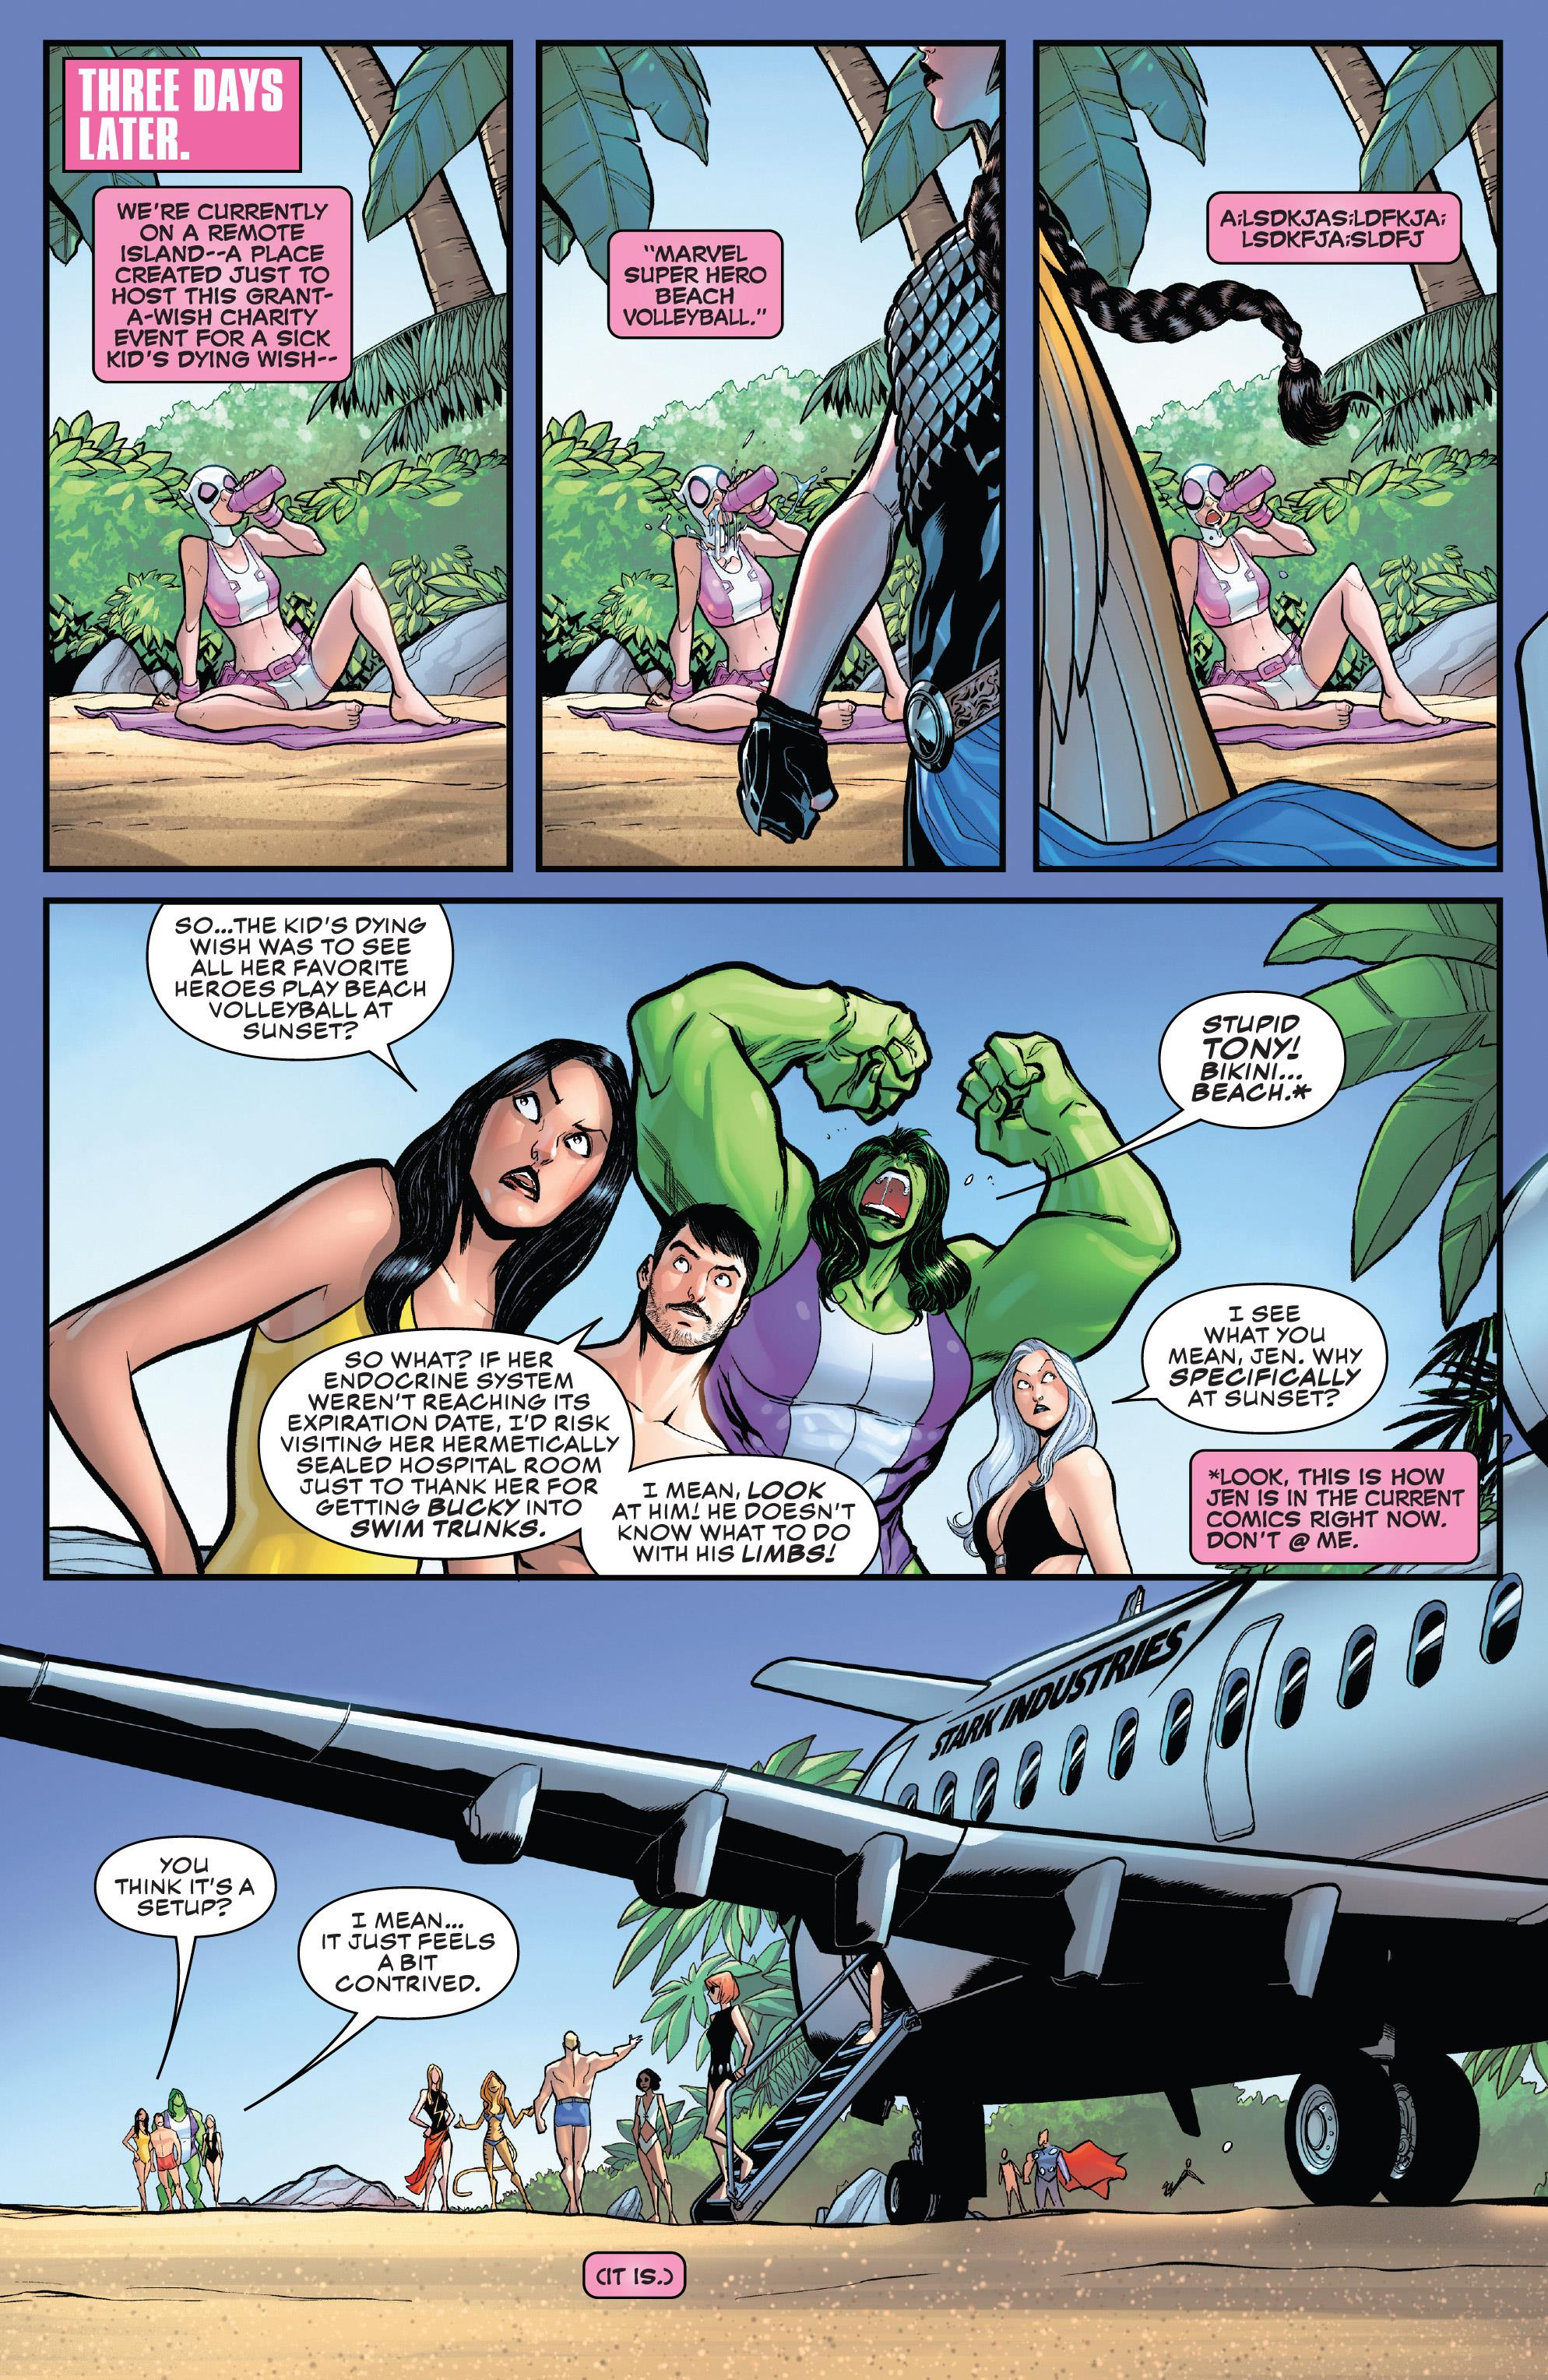 Gwenpool Strikes Back V2019 #003 (2019) - Page 8